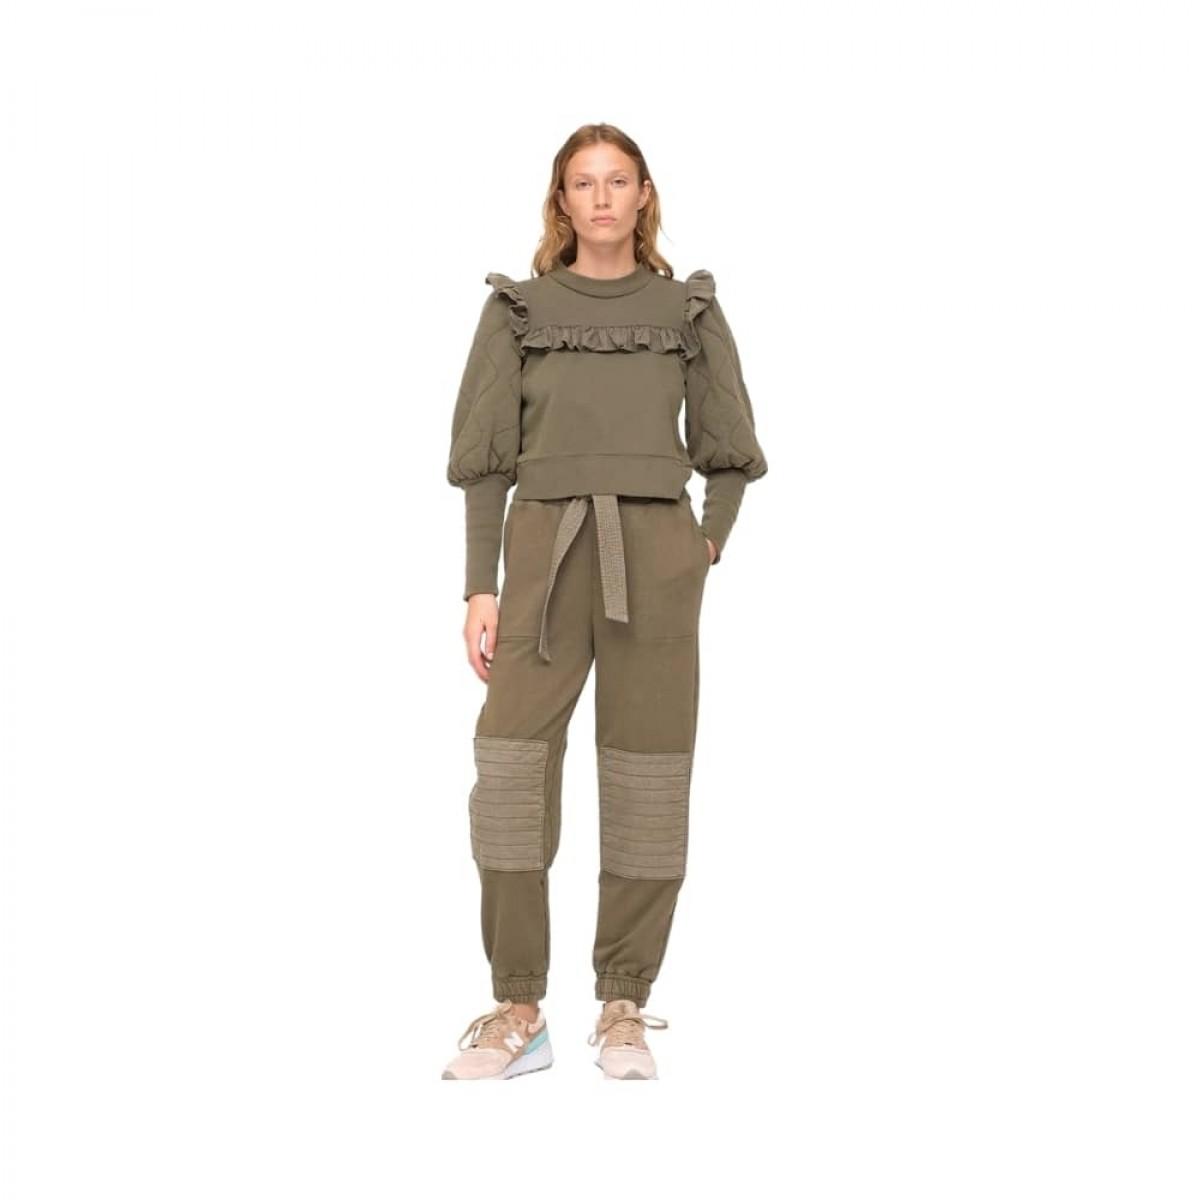 layla sweat pants - army - model front